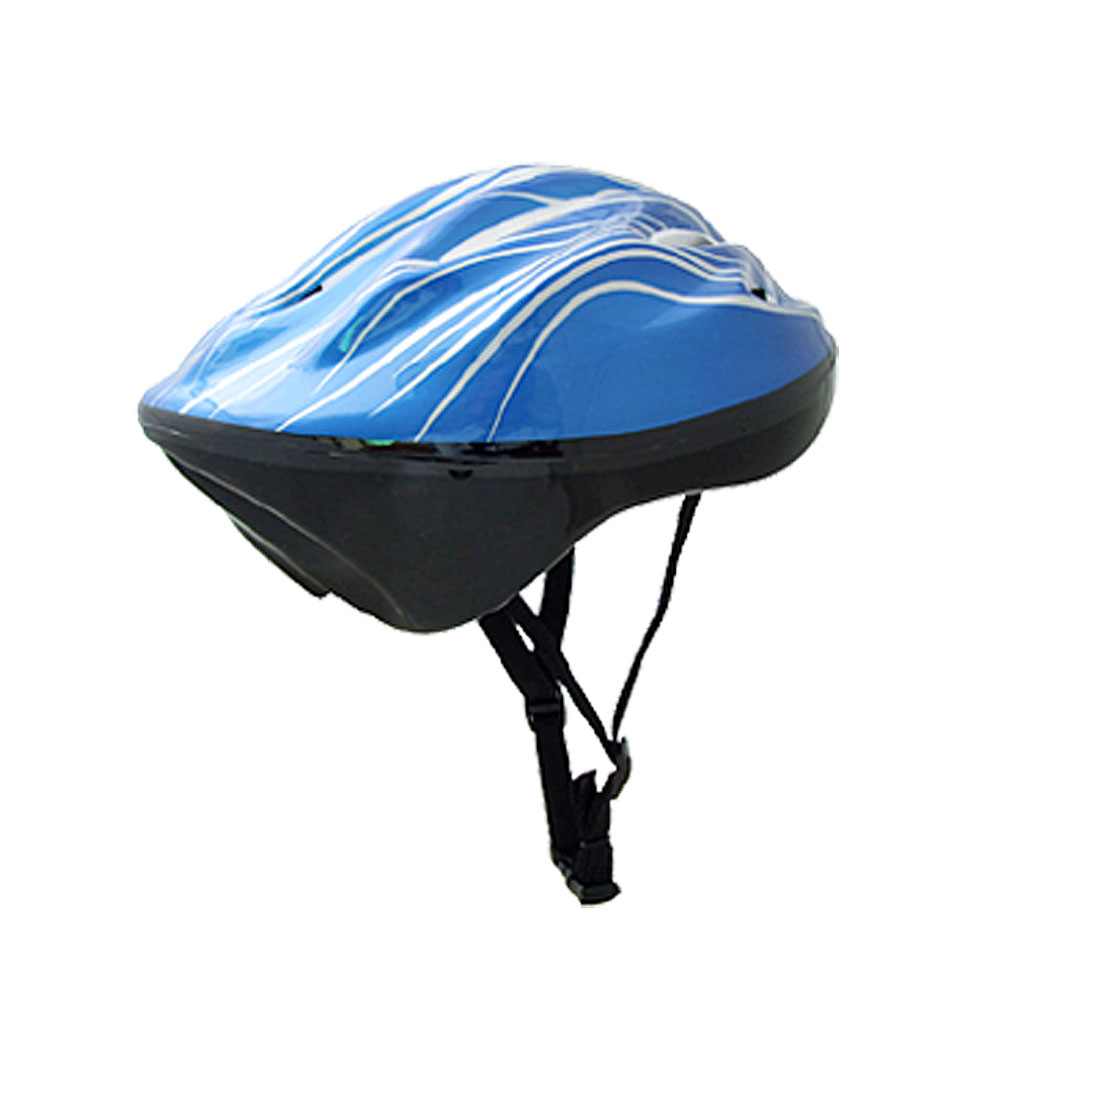 Unisex Cycling Skateboard Helmet Armet Blue Silver Tone